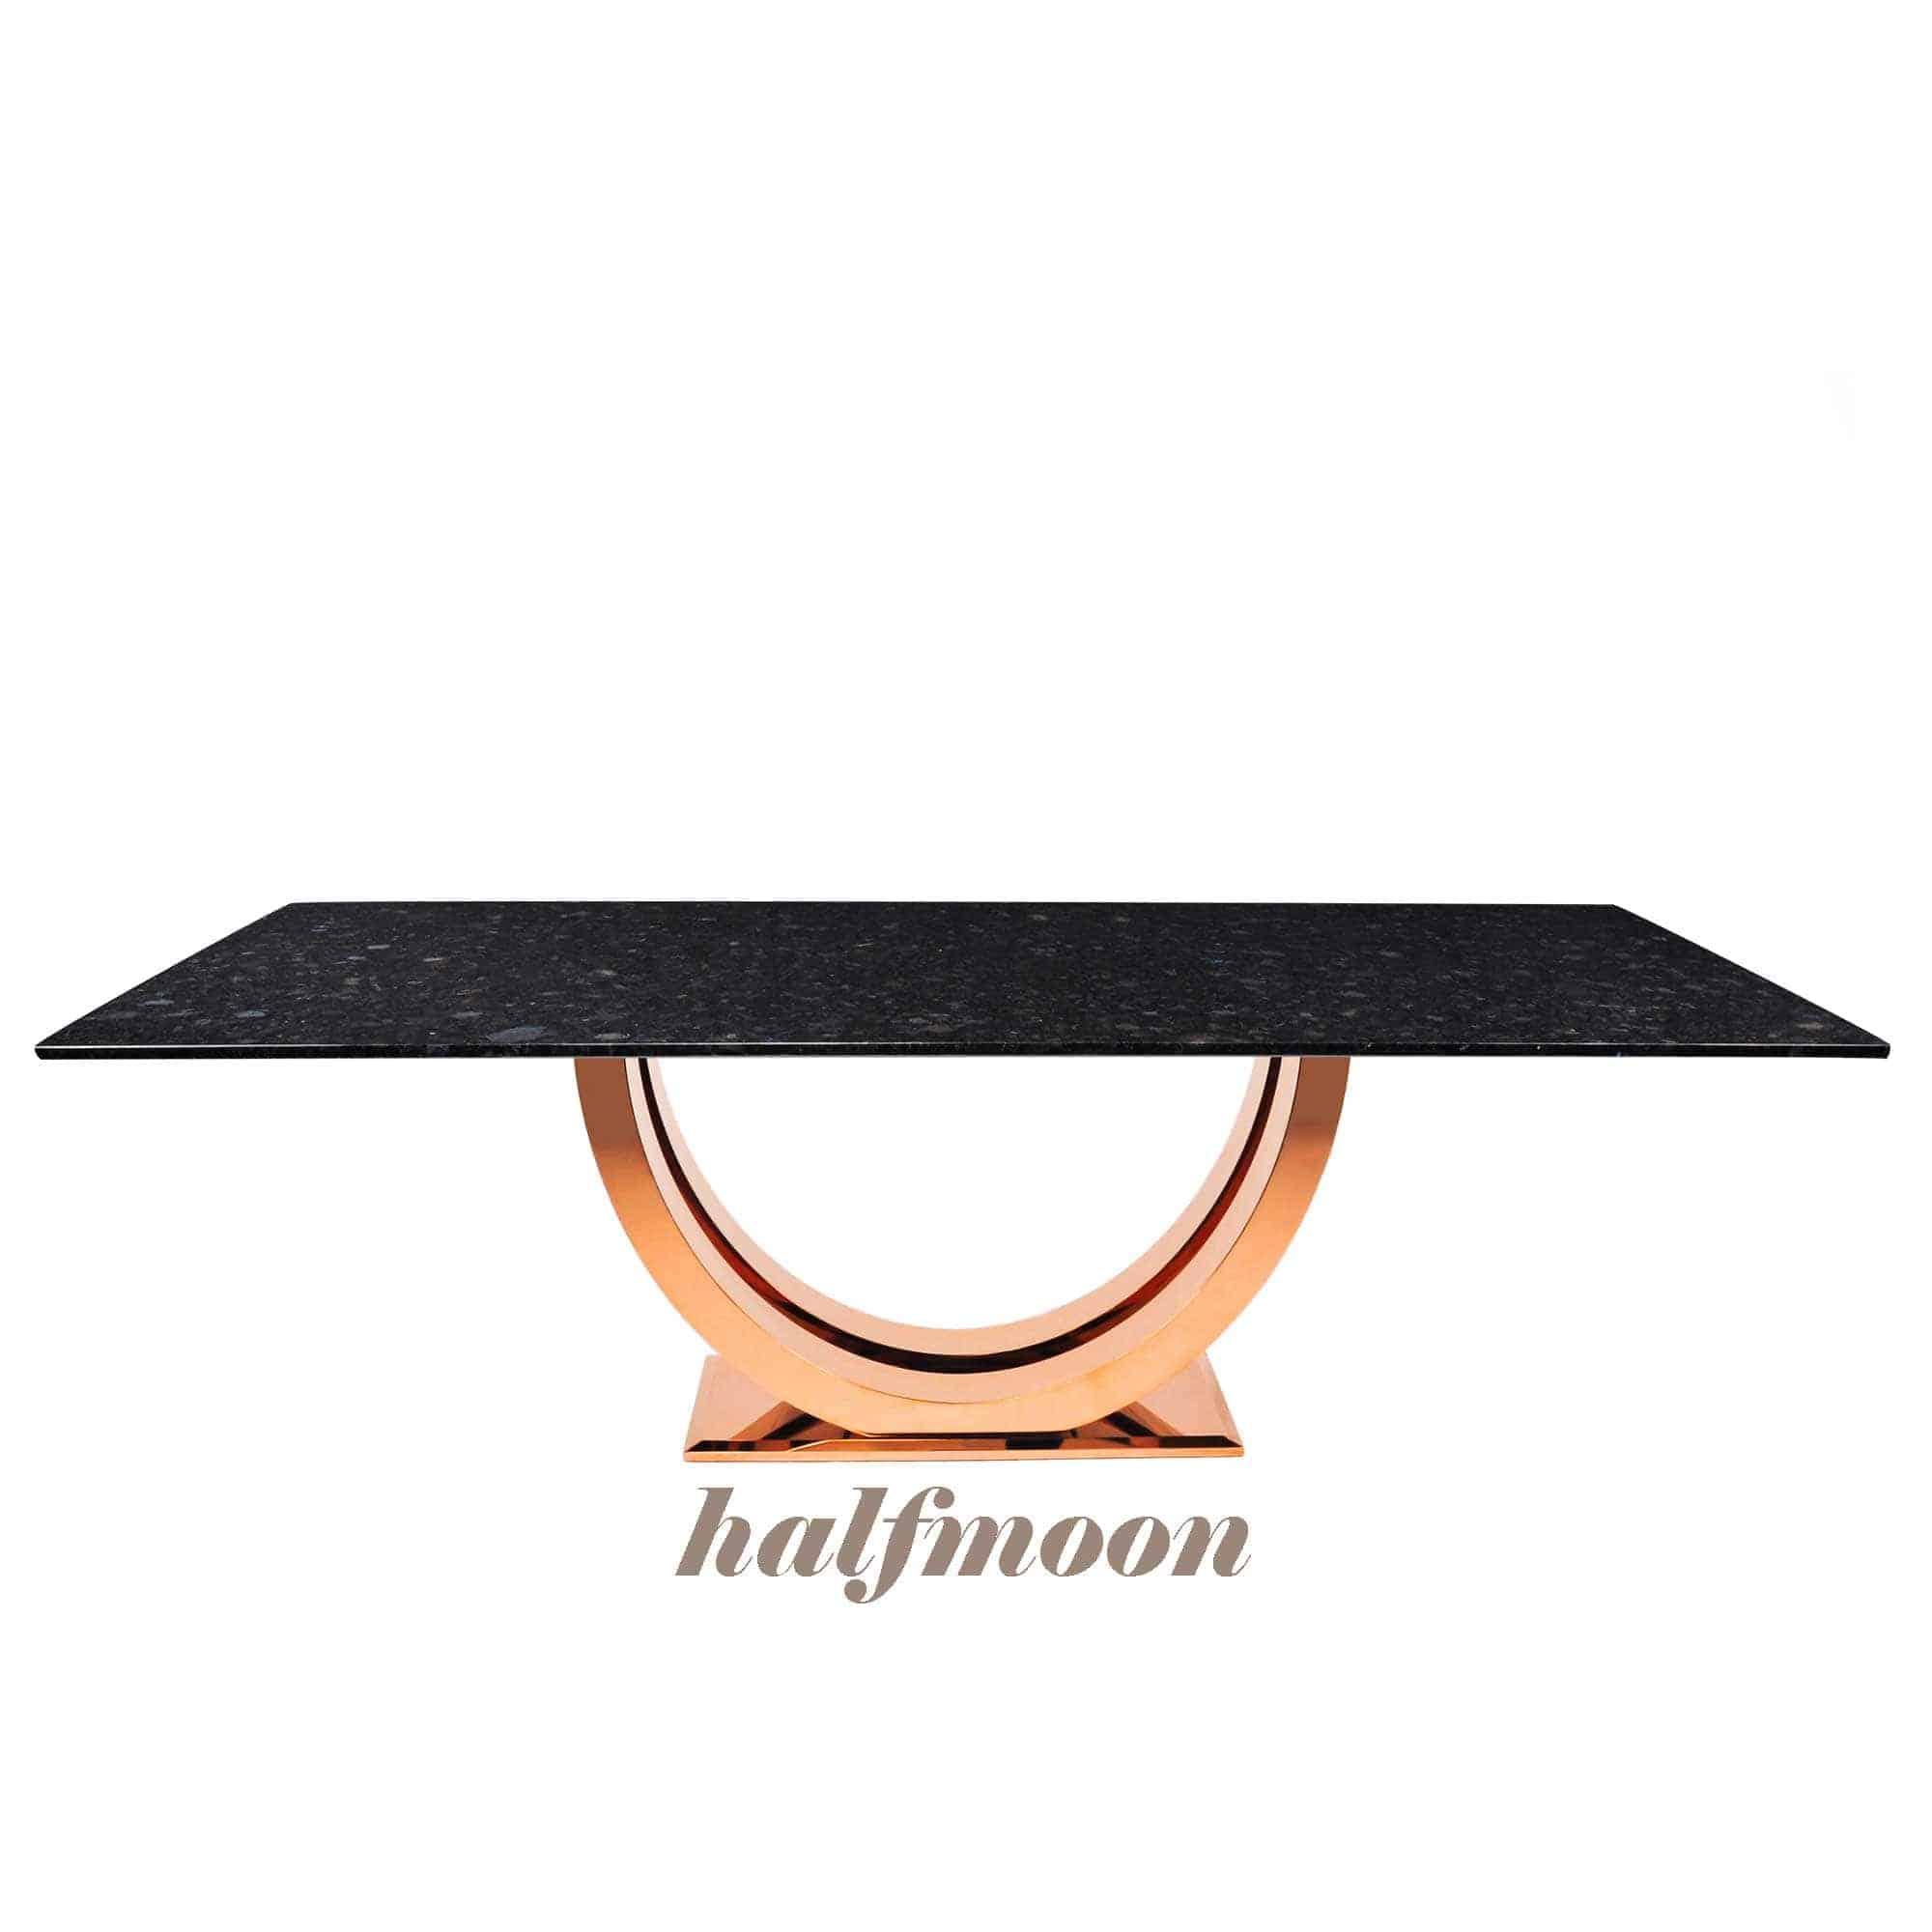 galatica-black-rectangular-granite-dining-table-8-to-10-pax-decasa-marble-2400x1100mm-halfmoon-rg